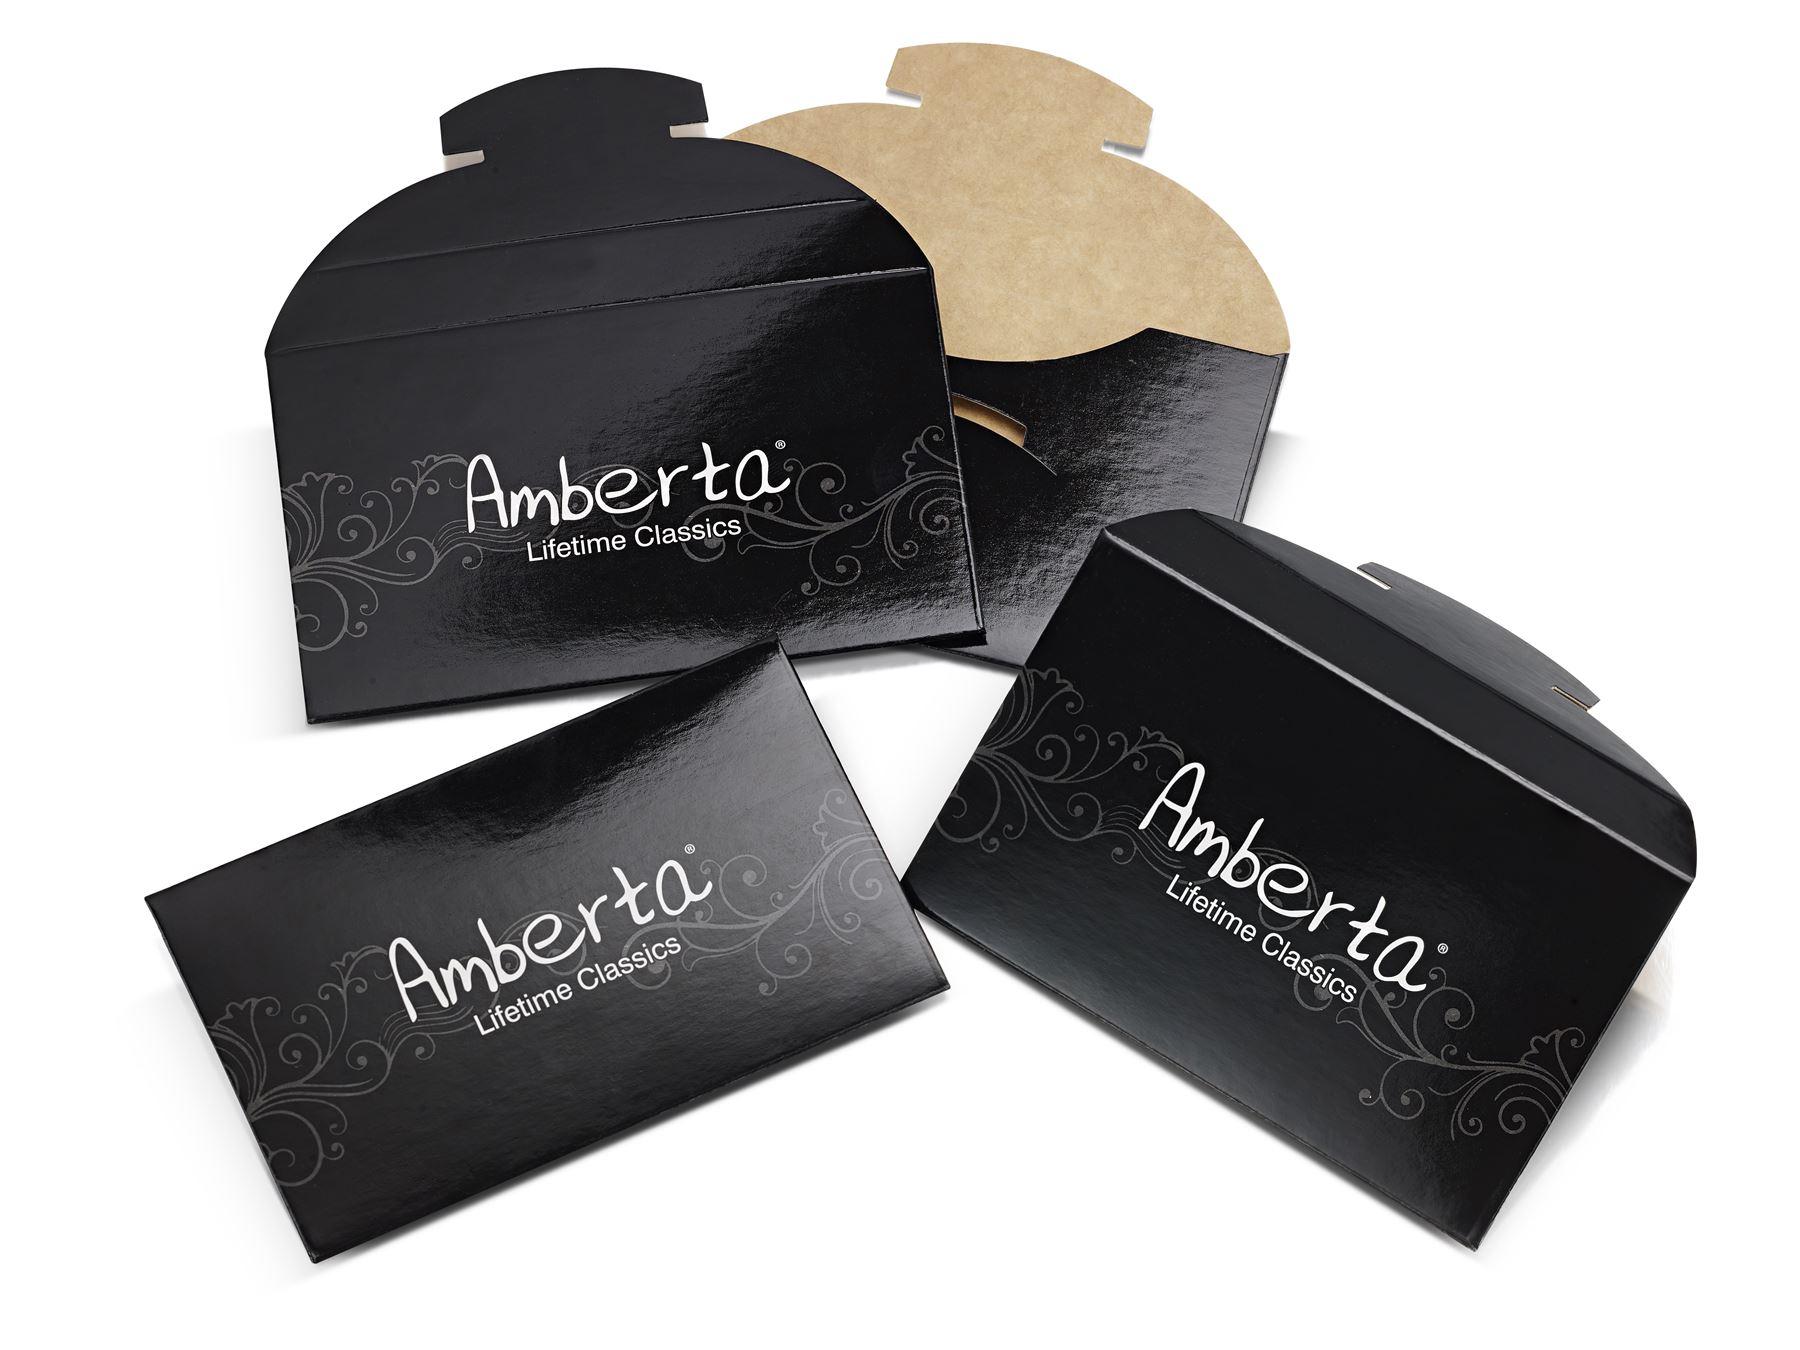 Amberta-Medallon-en-Fina-Plata-De-Ley-925-en-Formas-Diferentes-Para-Foto-y-Gemas miniatura 10